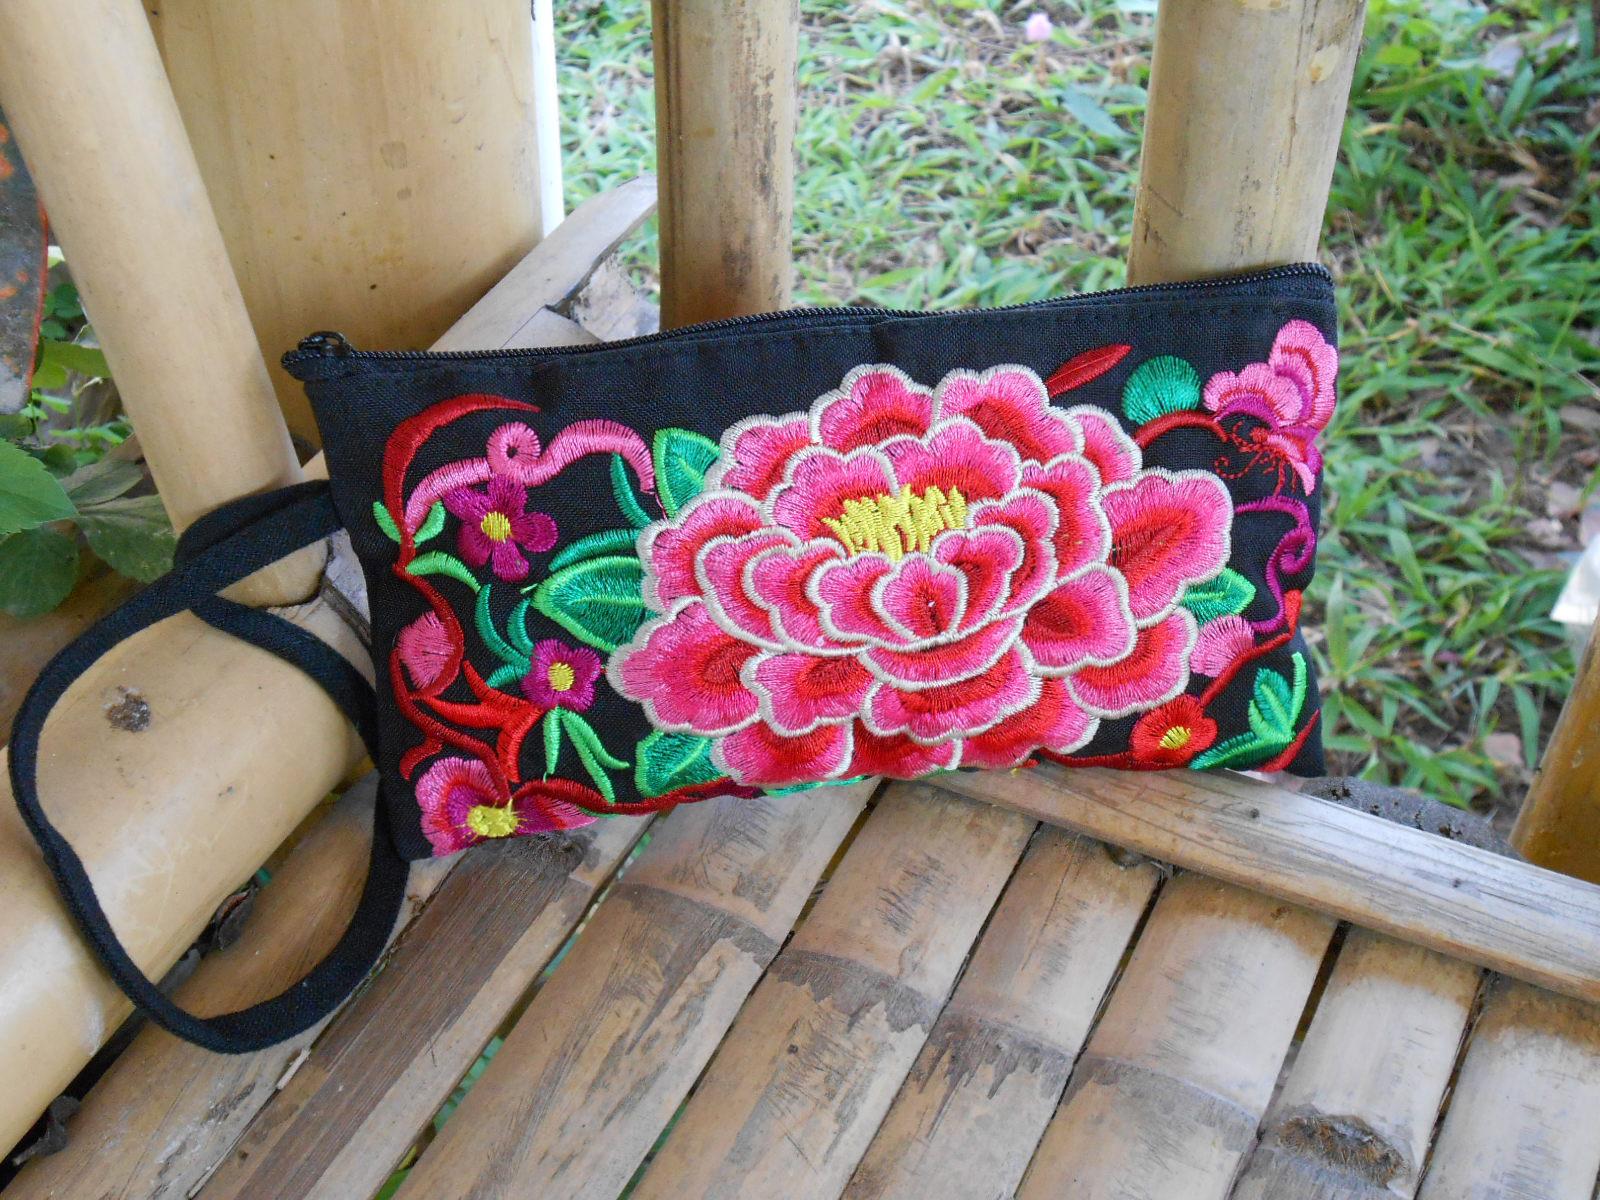 Pink Peony Flower Zipper Wristlet Clutch Wallet Purse Embroidered